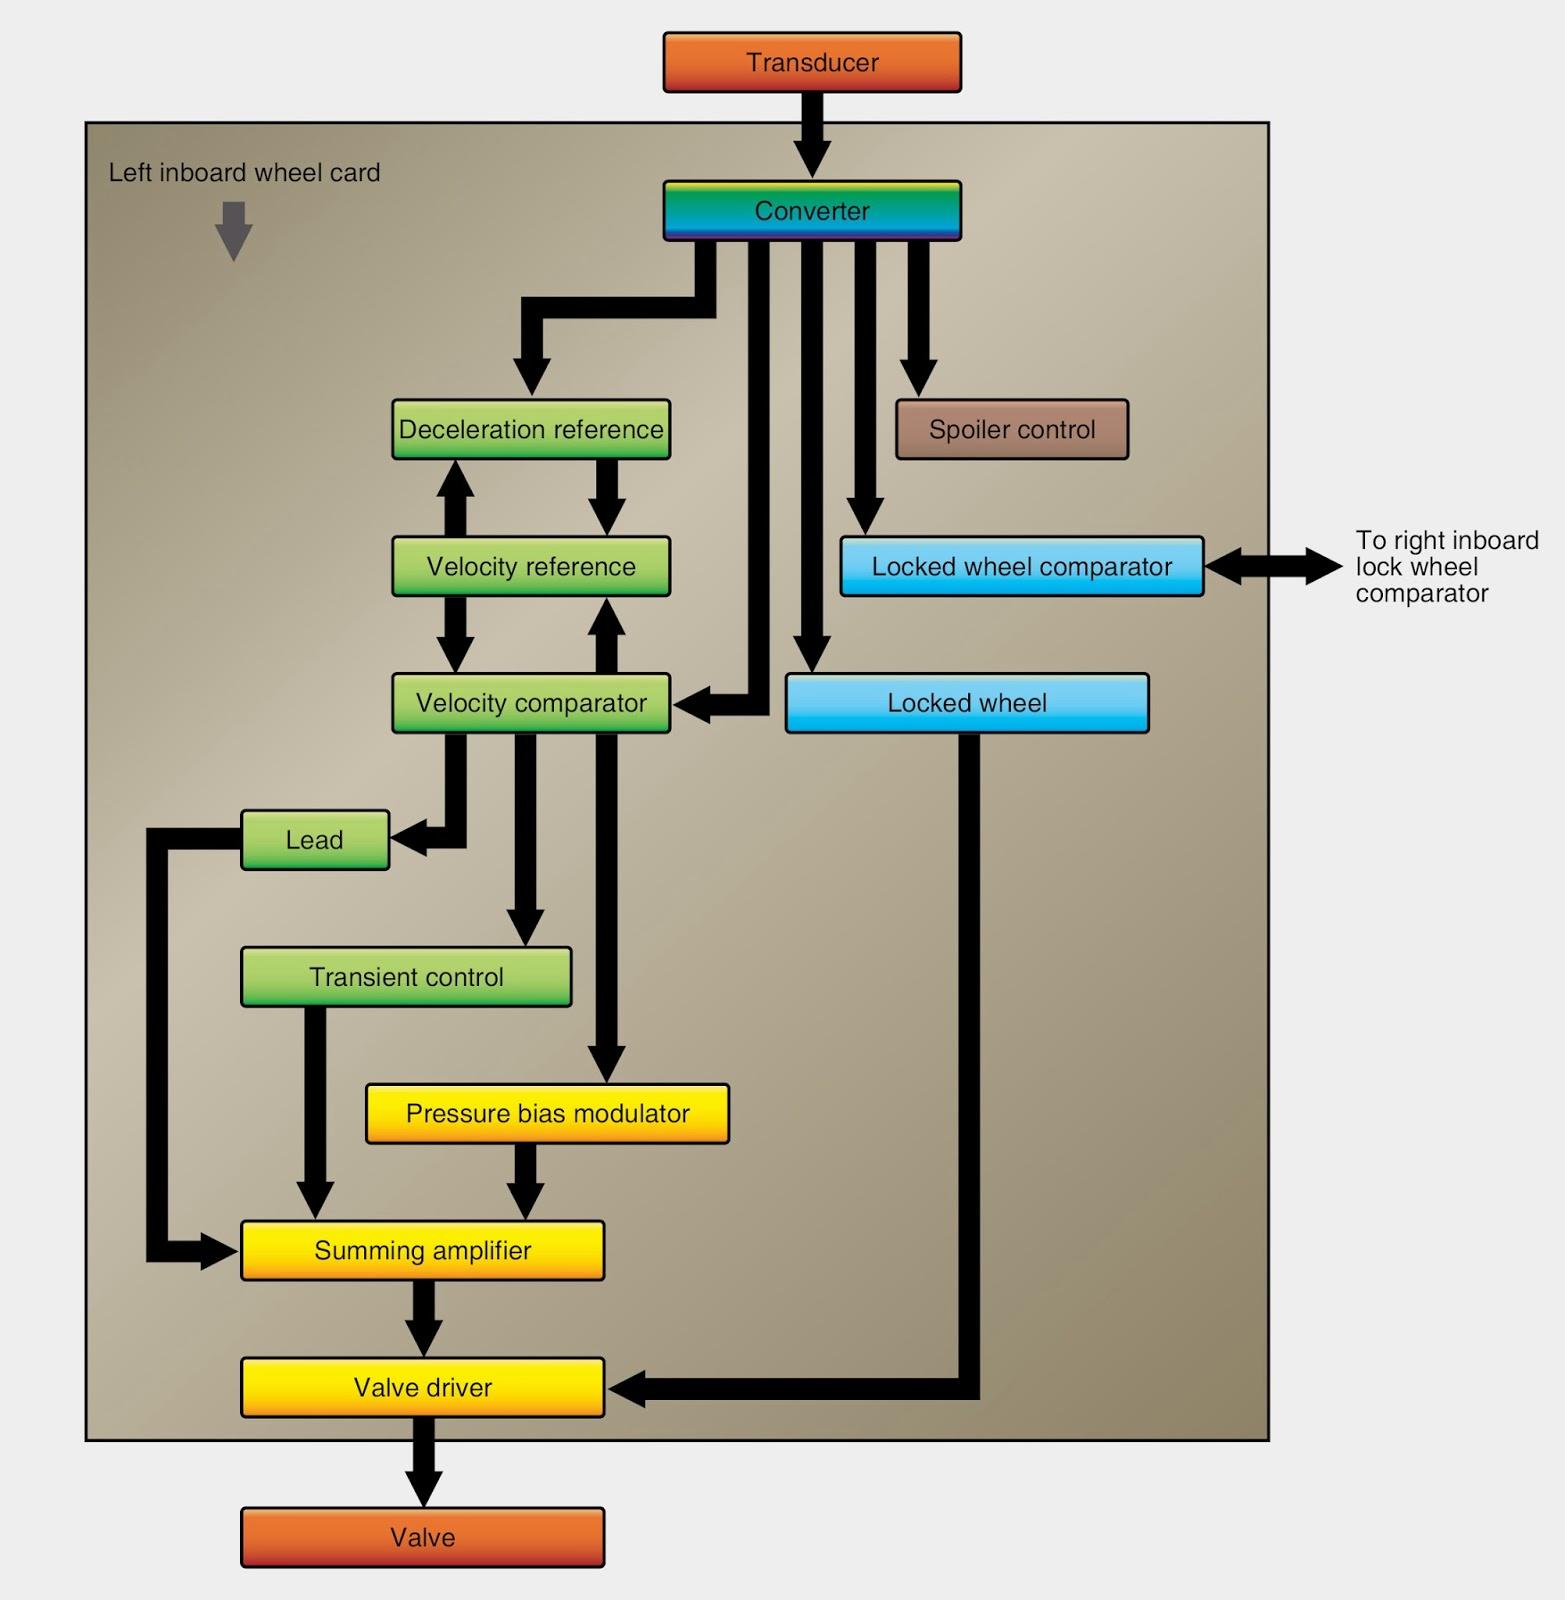 kazuma 49cc quad wiring diagram ac universal motor w4 igesetze de generic tekonsha voyager rh 6iconici bresilient co 50cc